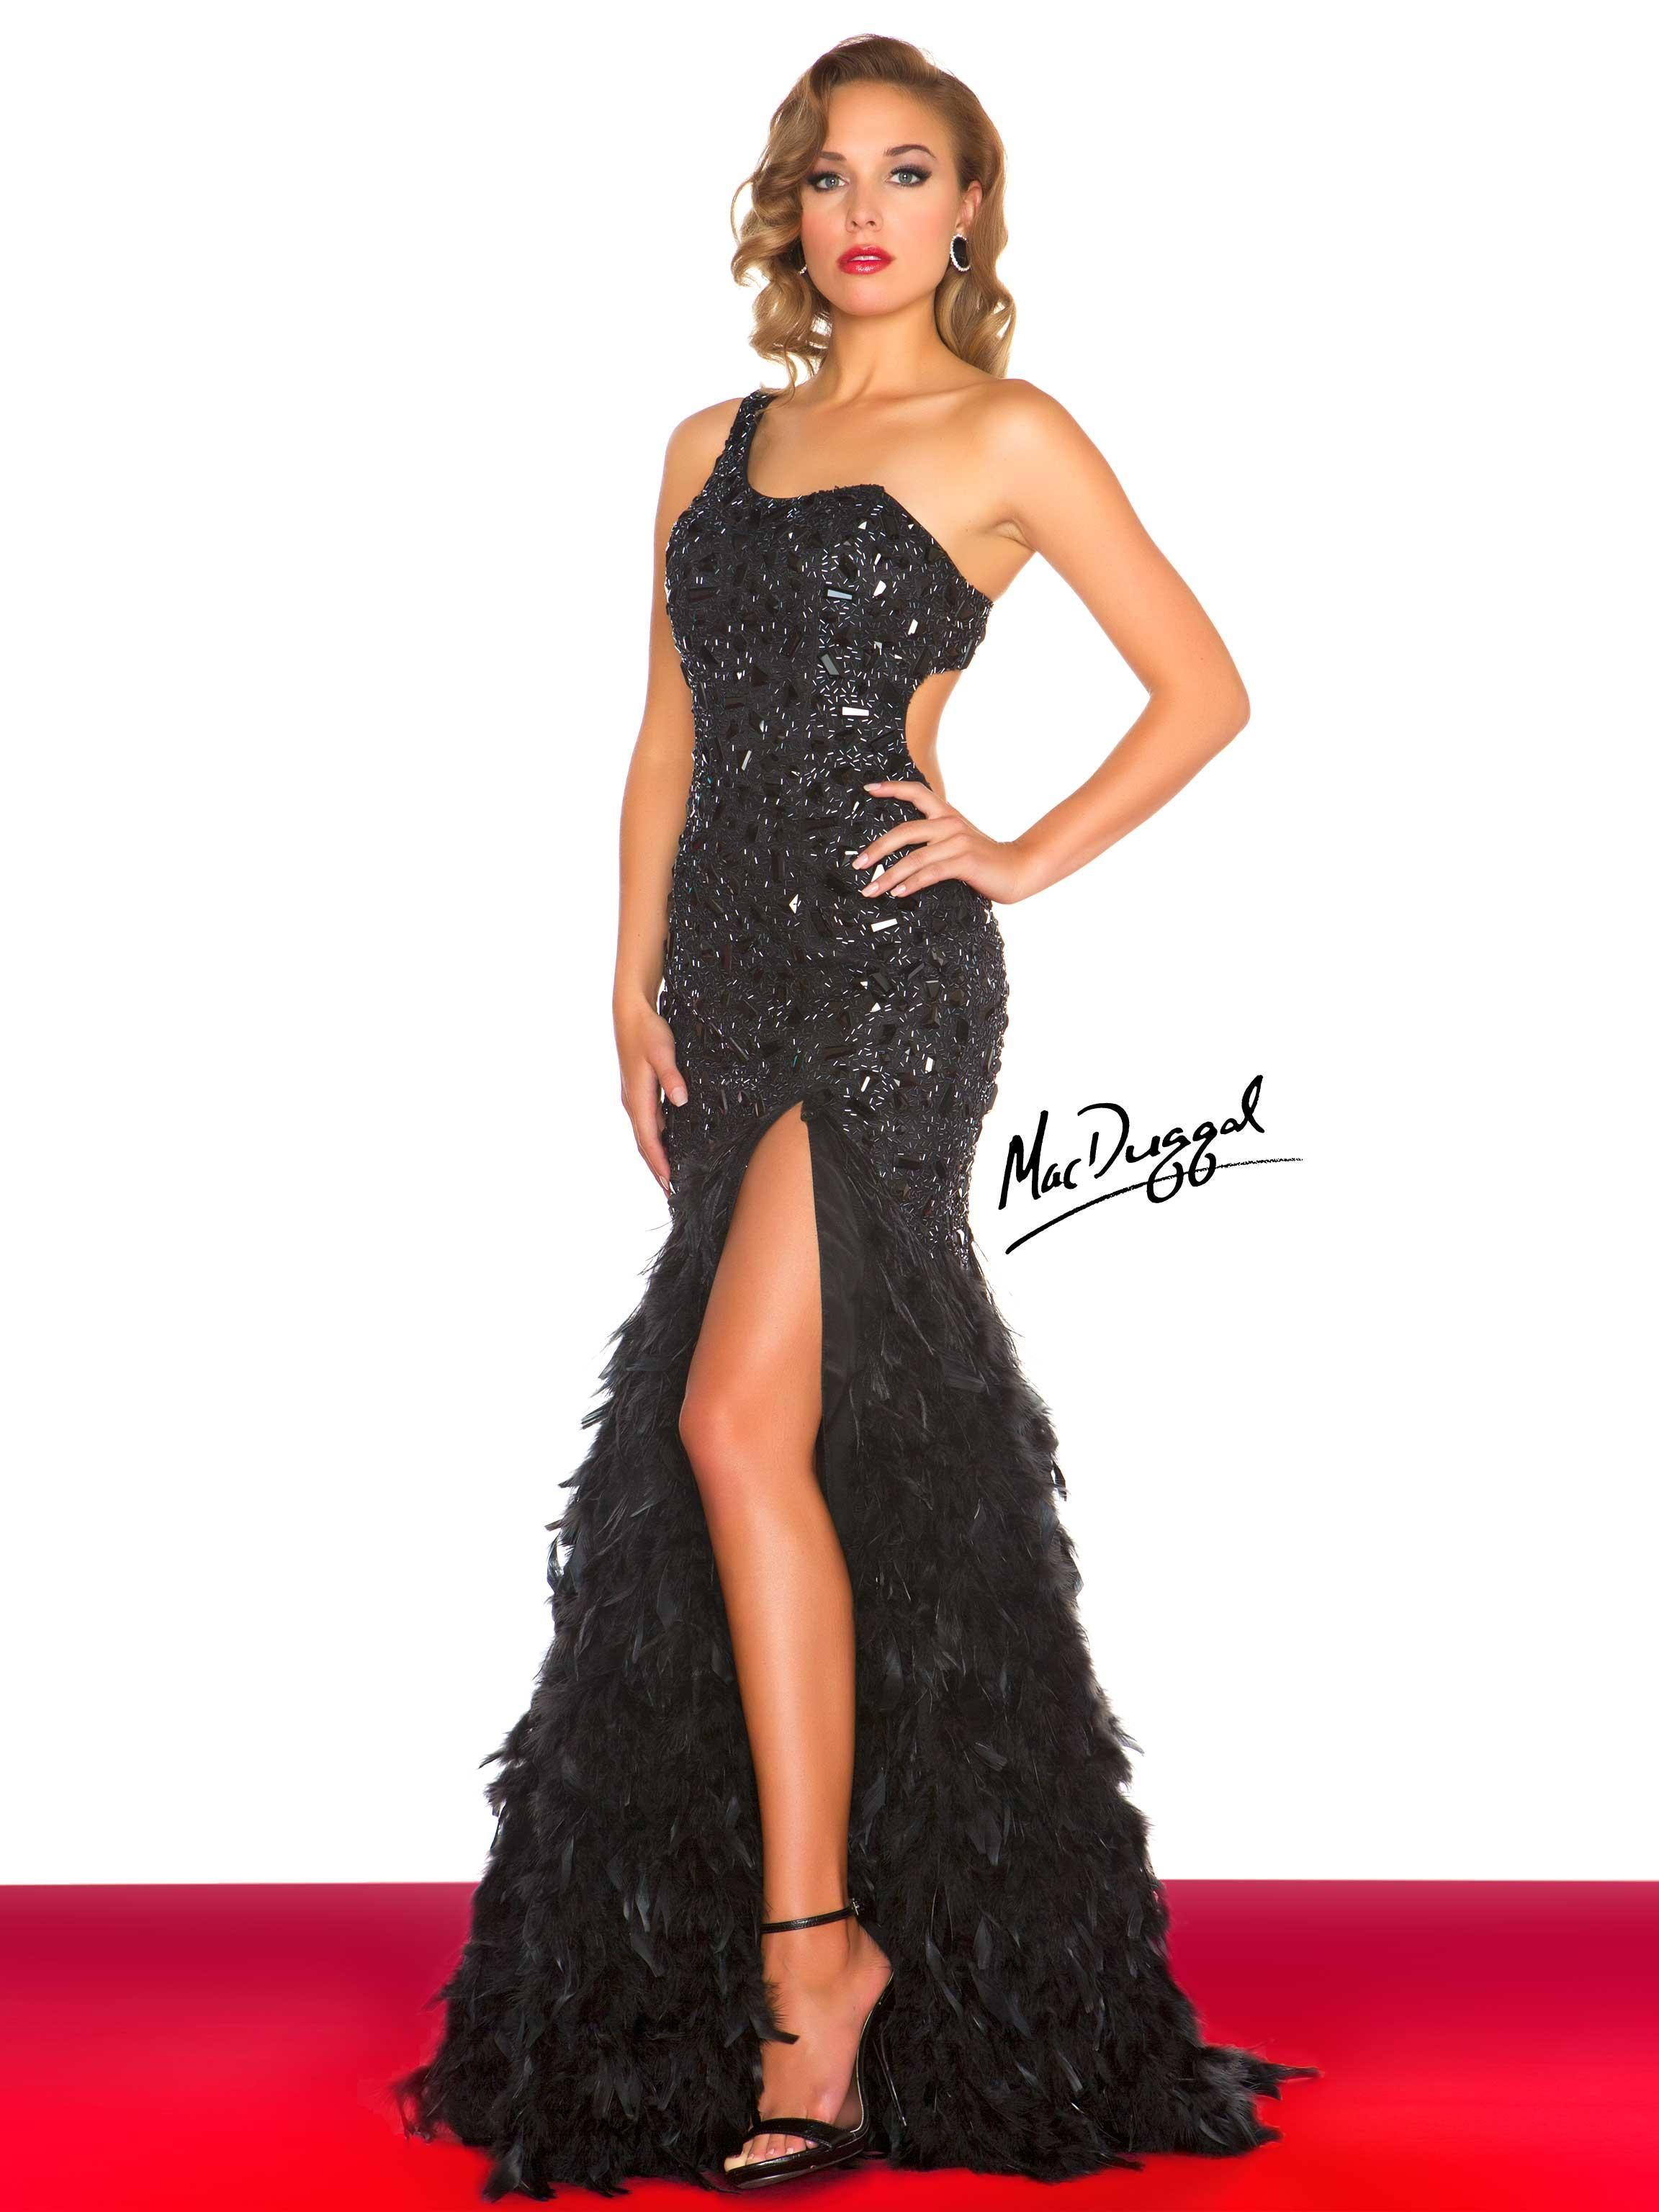 Macduggal dress ideas pinterest prom and fashion